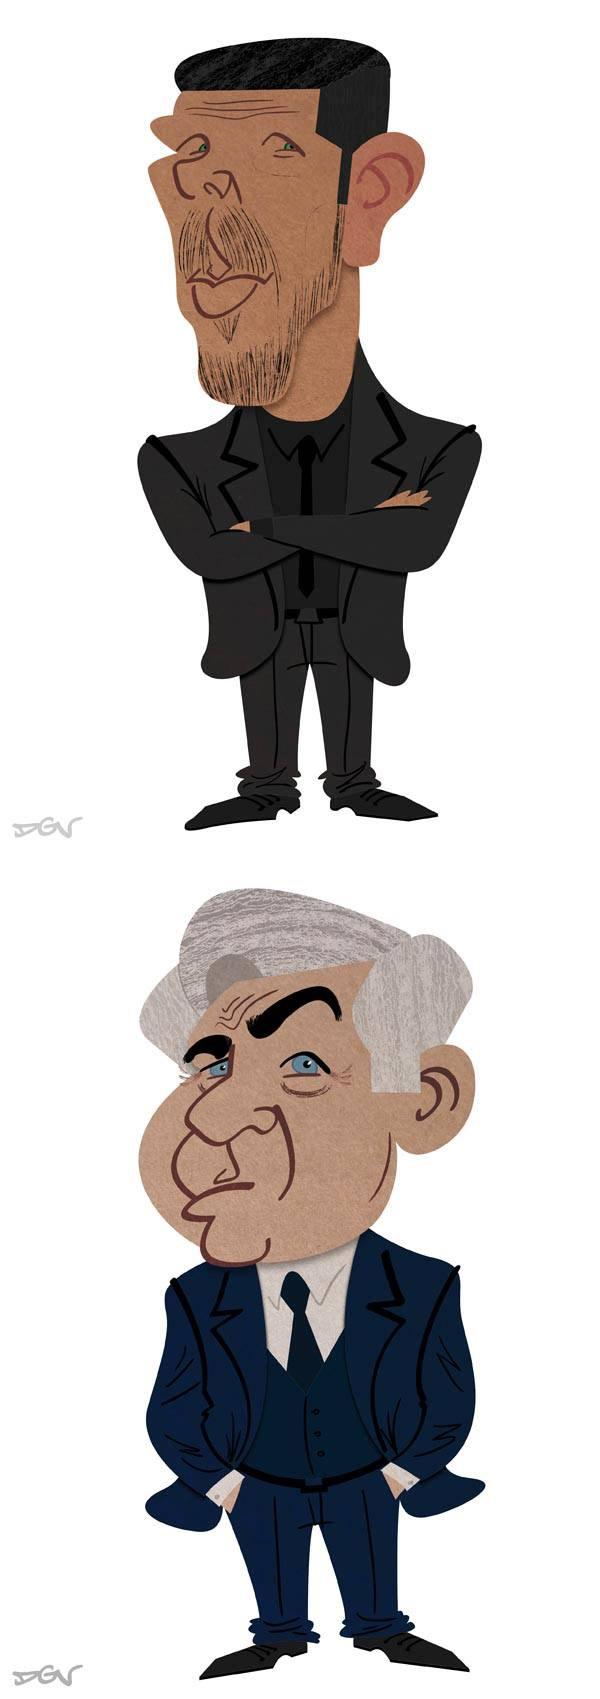 Caricaturas de Diego Pablo Simeone y Carlo Ancelotti